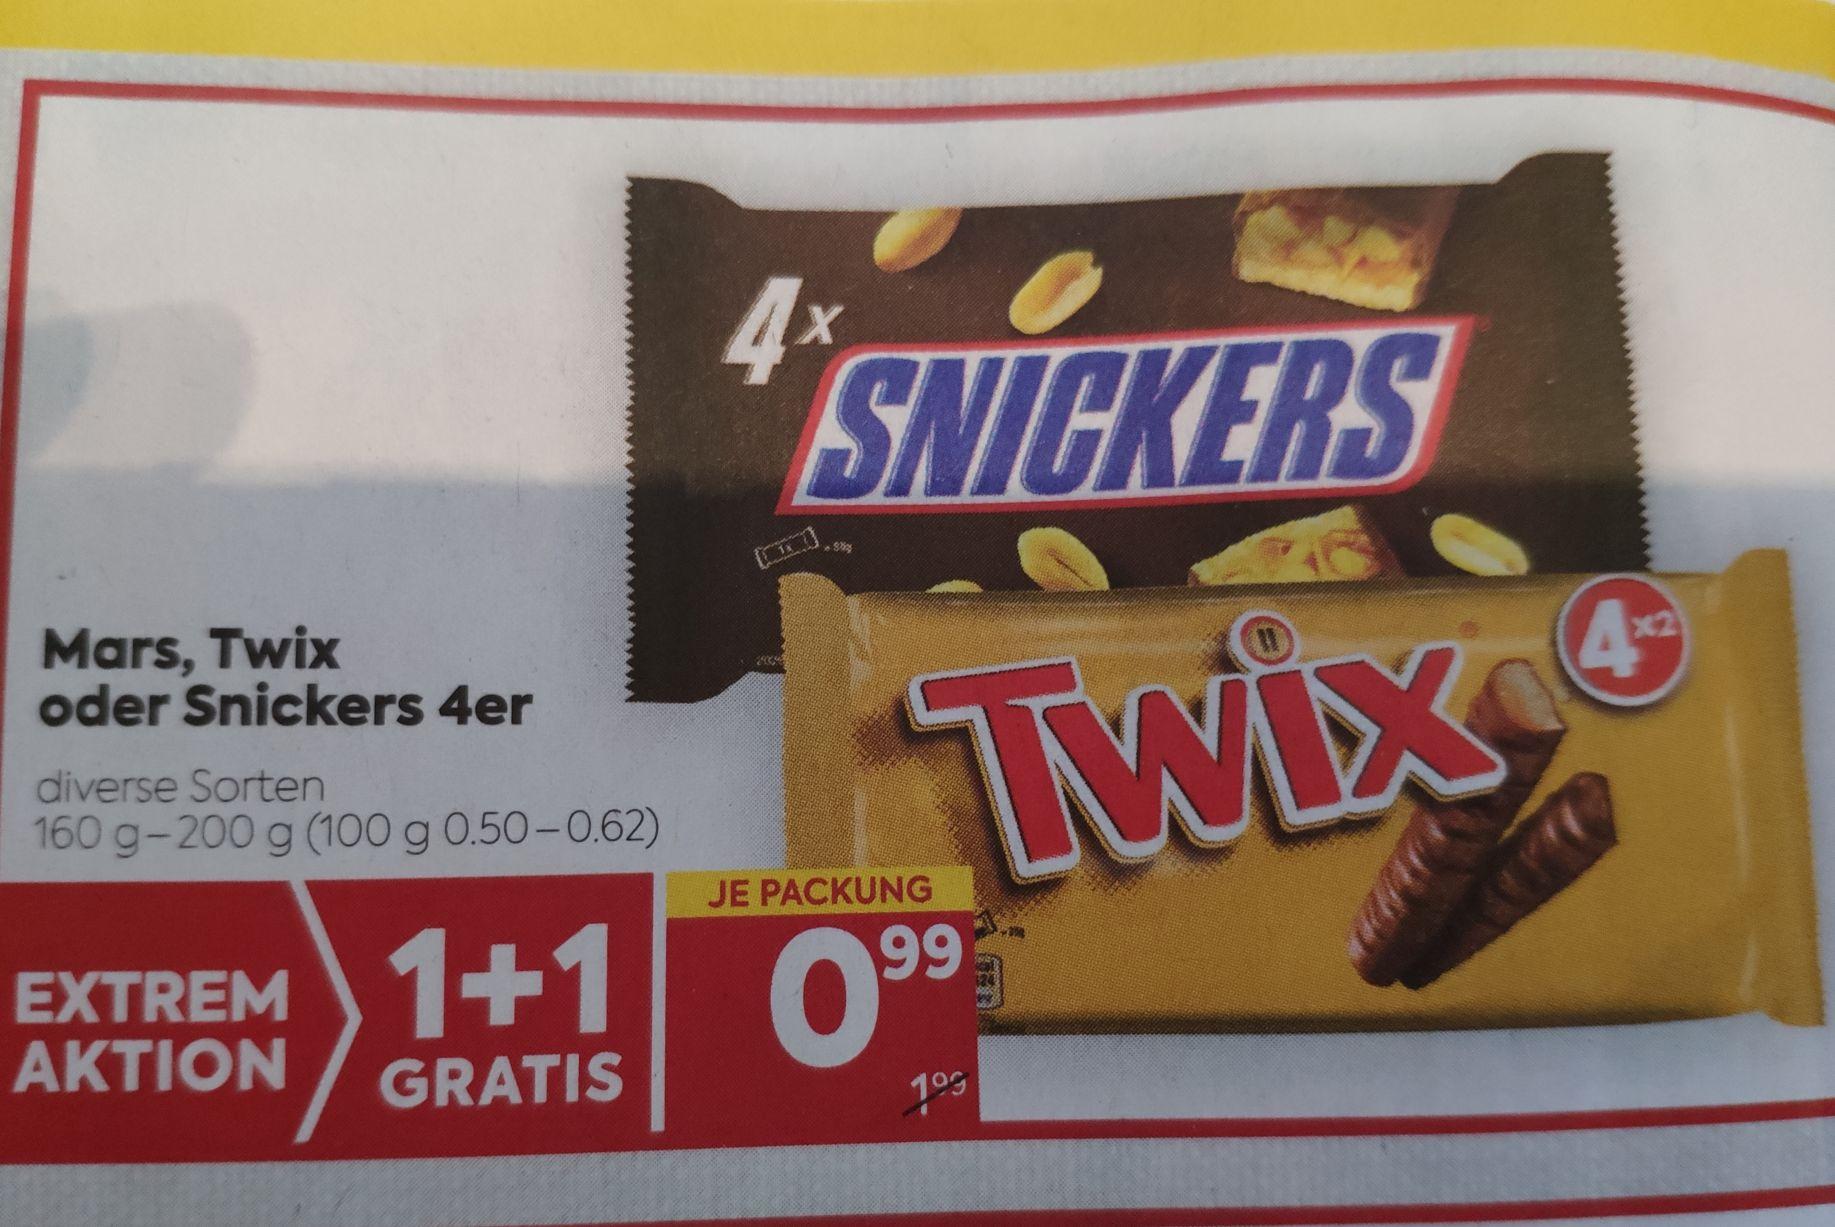 8 x Snickers / Twix / Mars (1+1)